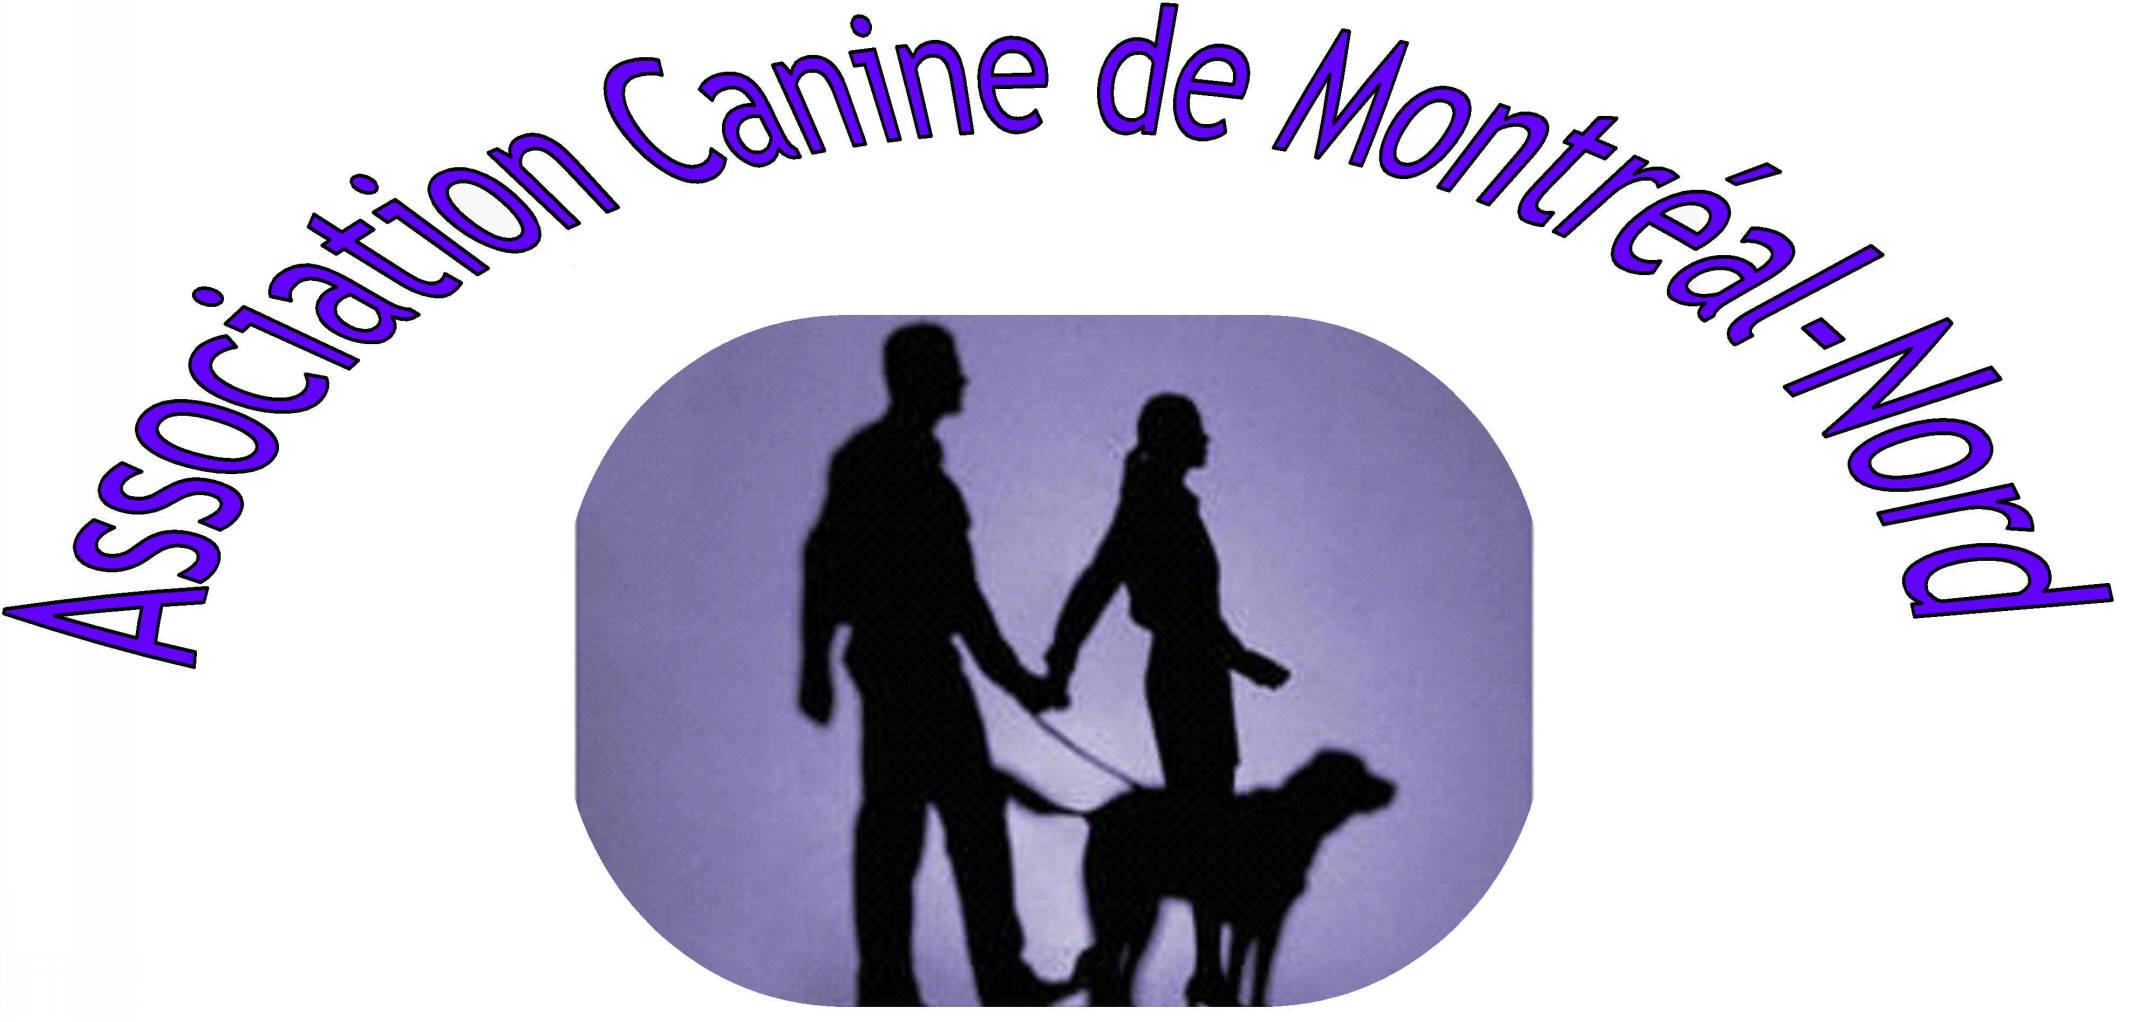 10c22a4611d File 127 http   www.canardscanins.ca.  assos montrealnord Logo1.jpg  3544731.75488KB